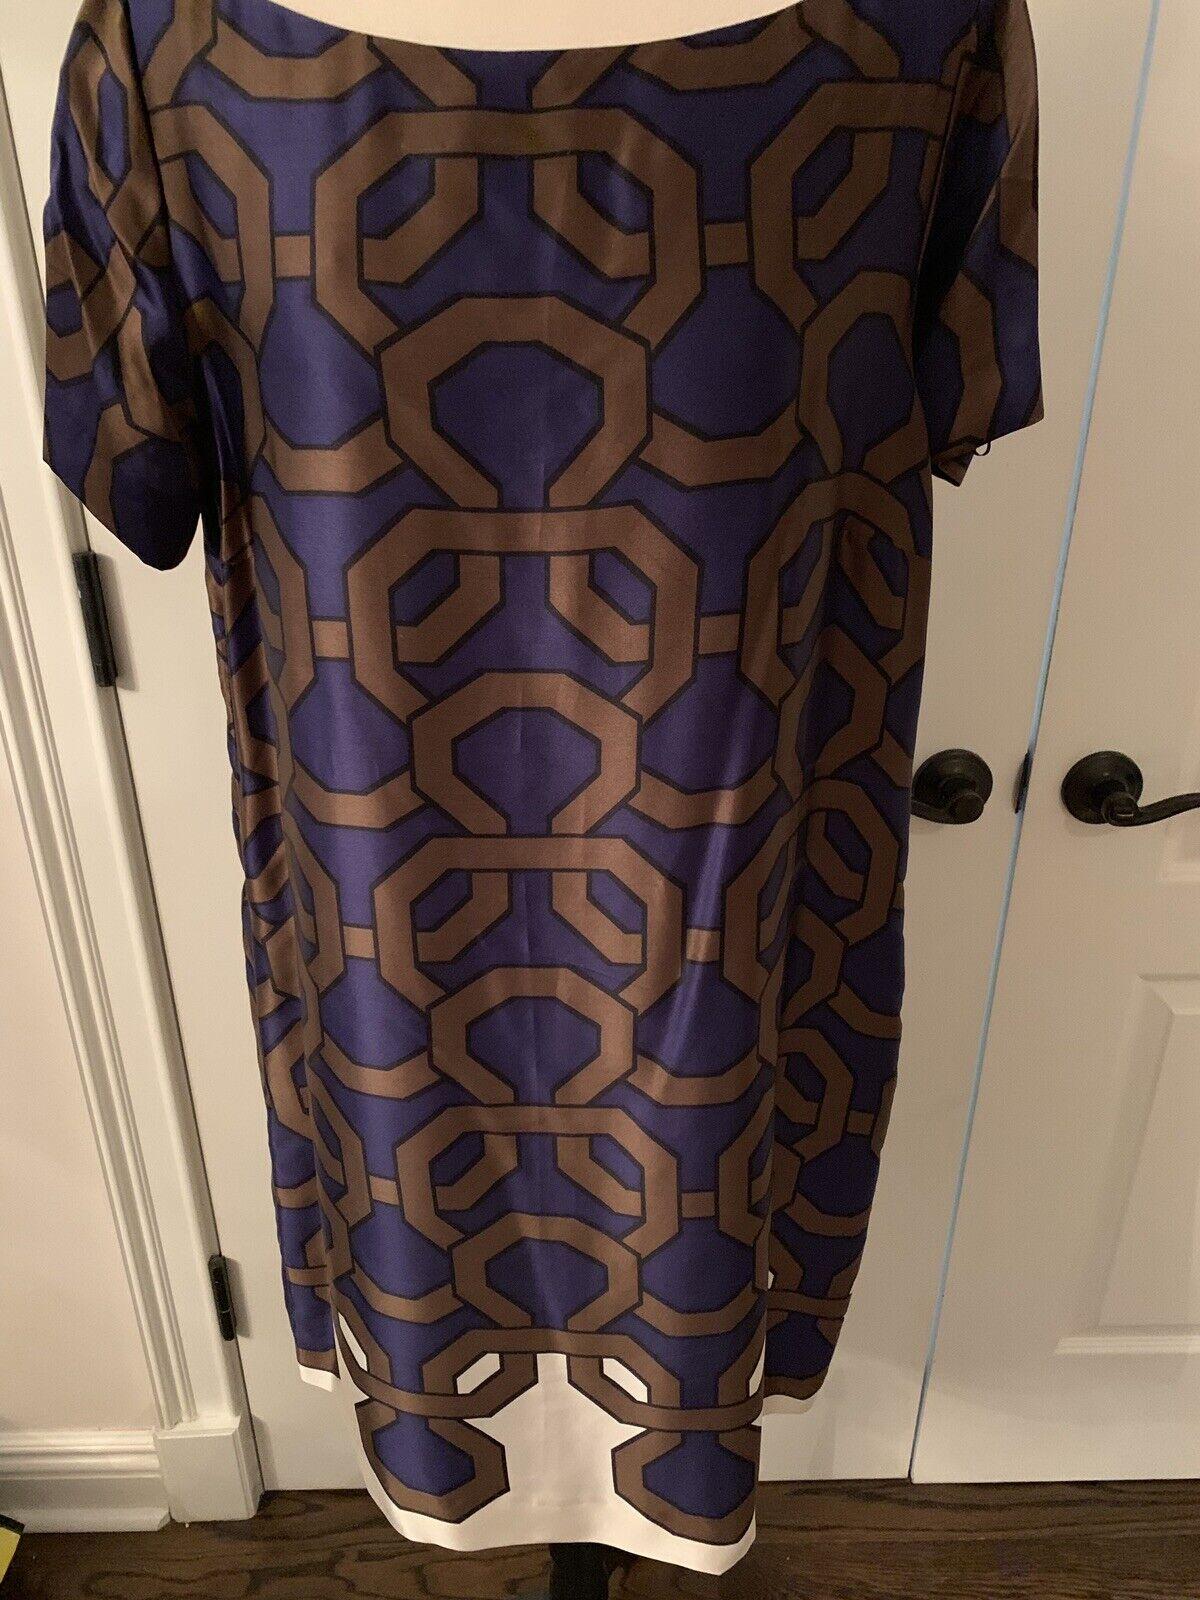 New damen's Multi-Farbe Designer ZARA Short Sleeve Dress Größe XL